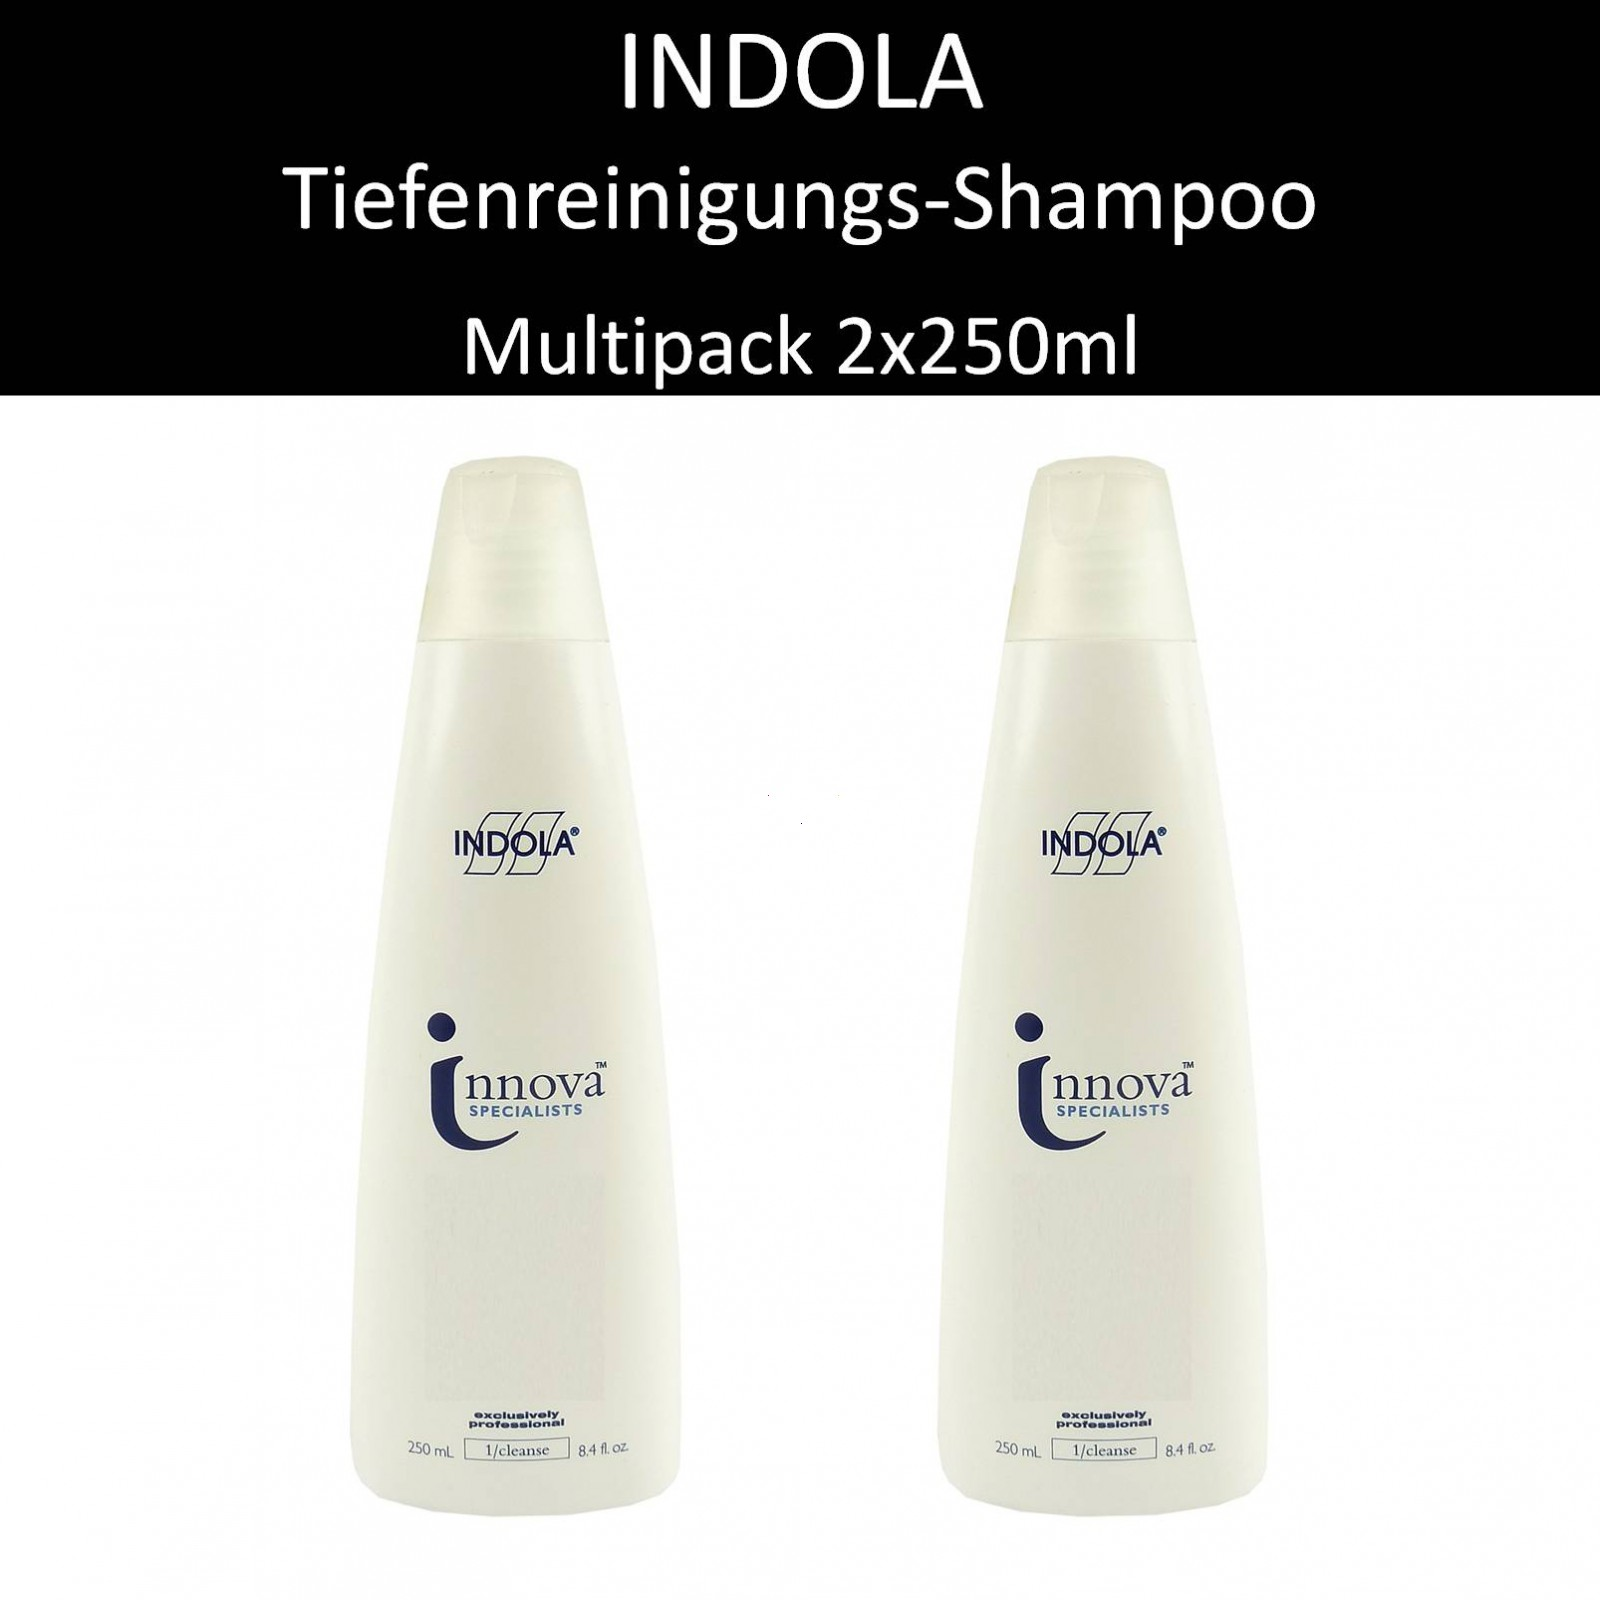 Indola Innova Specialists purifying shampoo Haar Pflege Reinigung  2x250ml